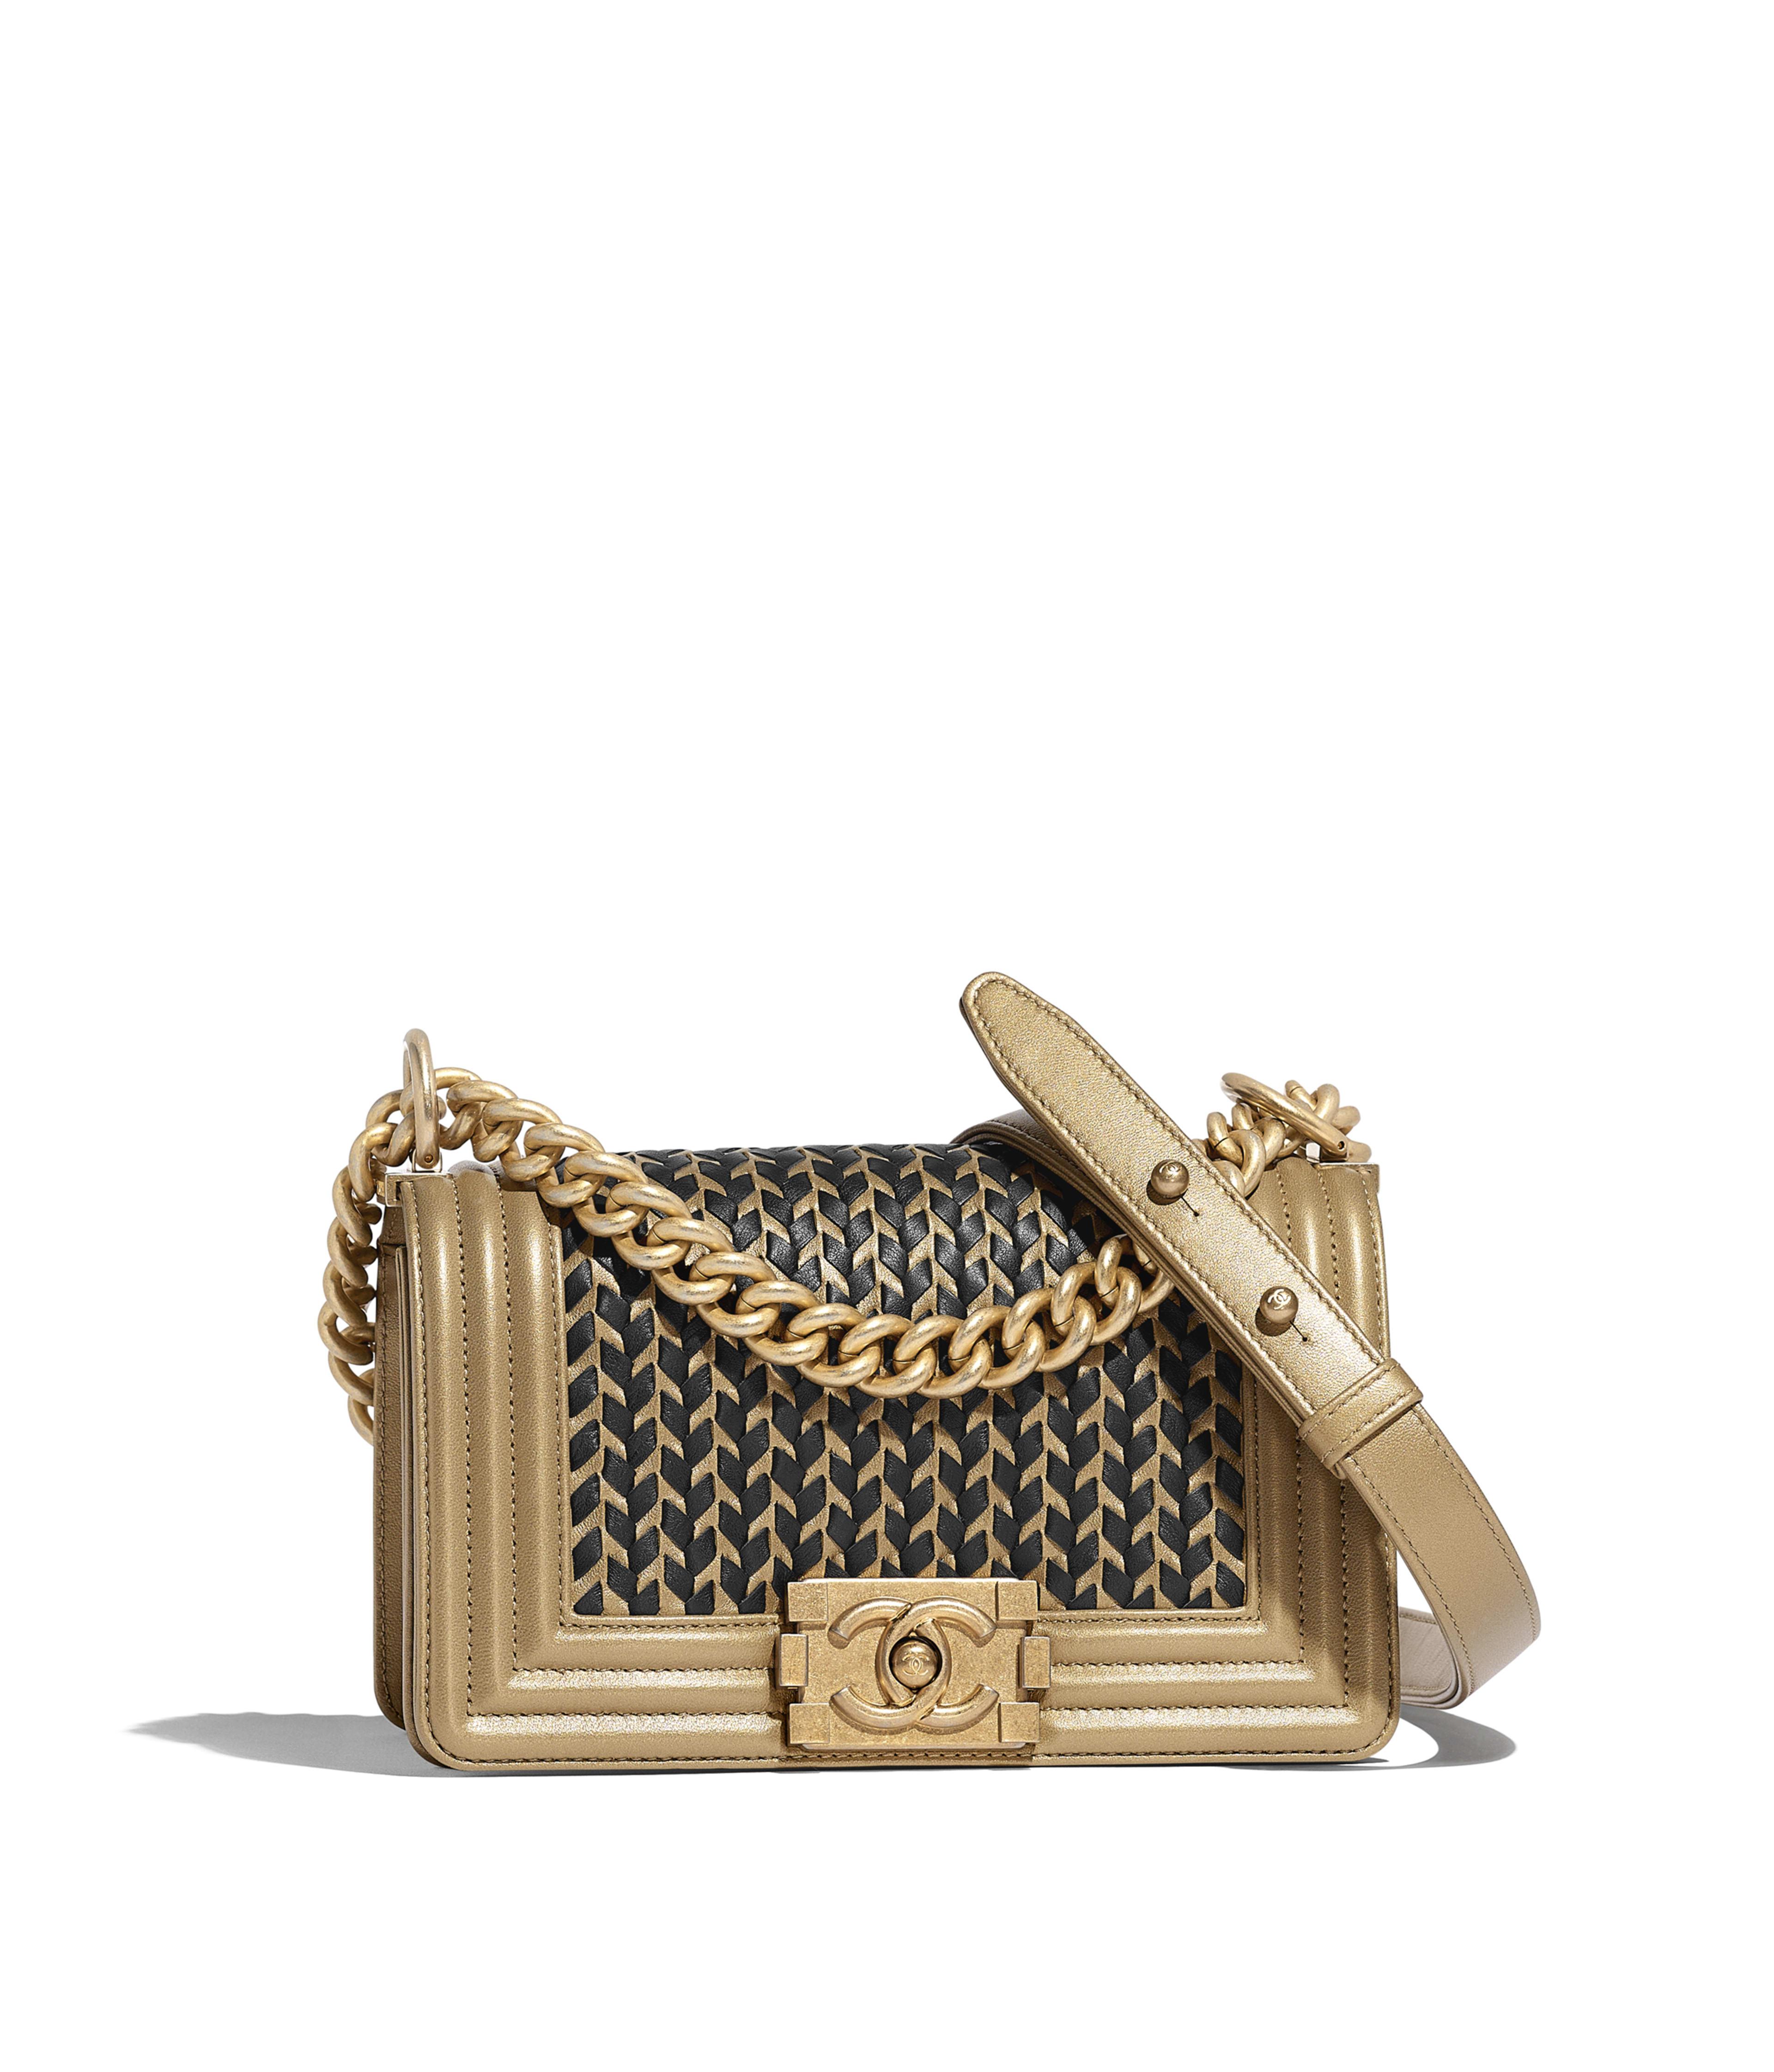 57c93e6225f2 Small BOY CHANEL Handbag Metallic Lambskin & Gold-Tone Metal, Gold & Black  Ref. A67085B00698N4738